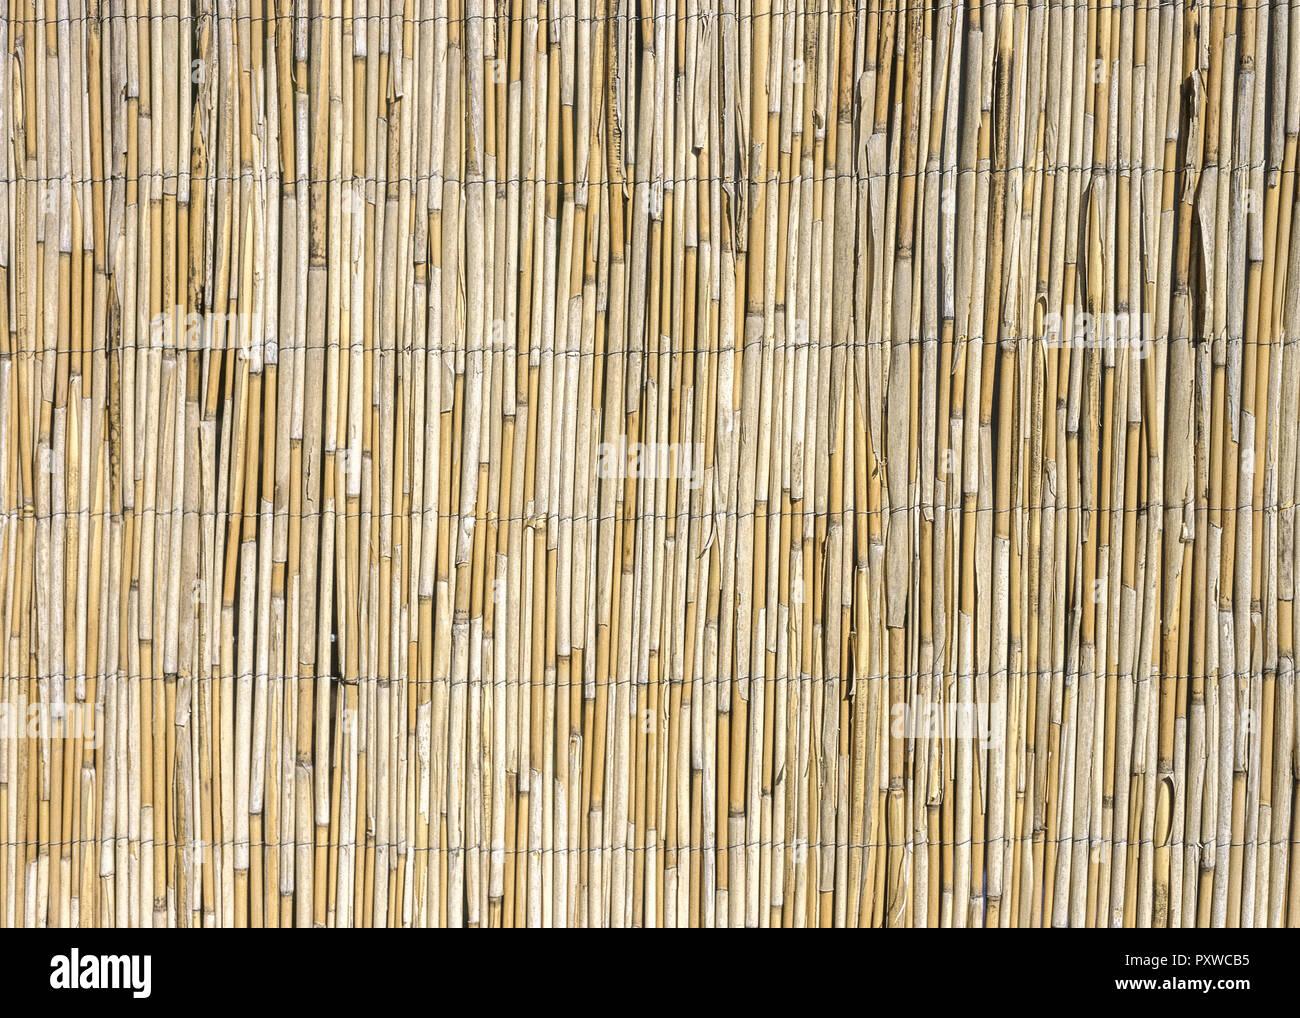 Sichtschutzzaun Aus Bambus Stock Photo Alamy